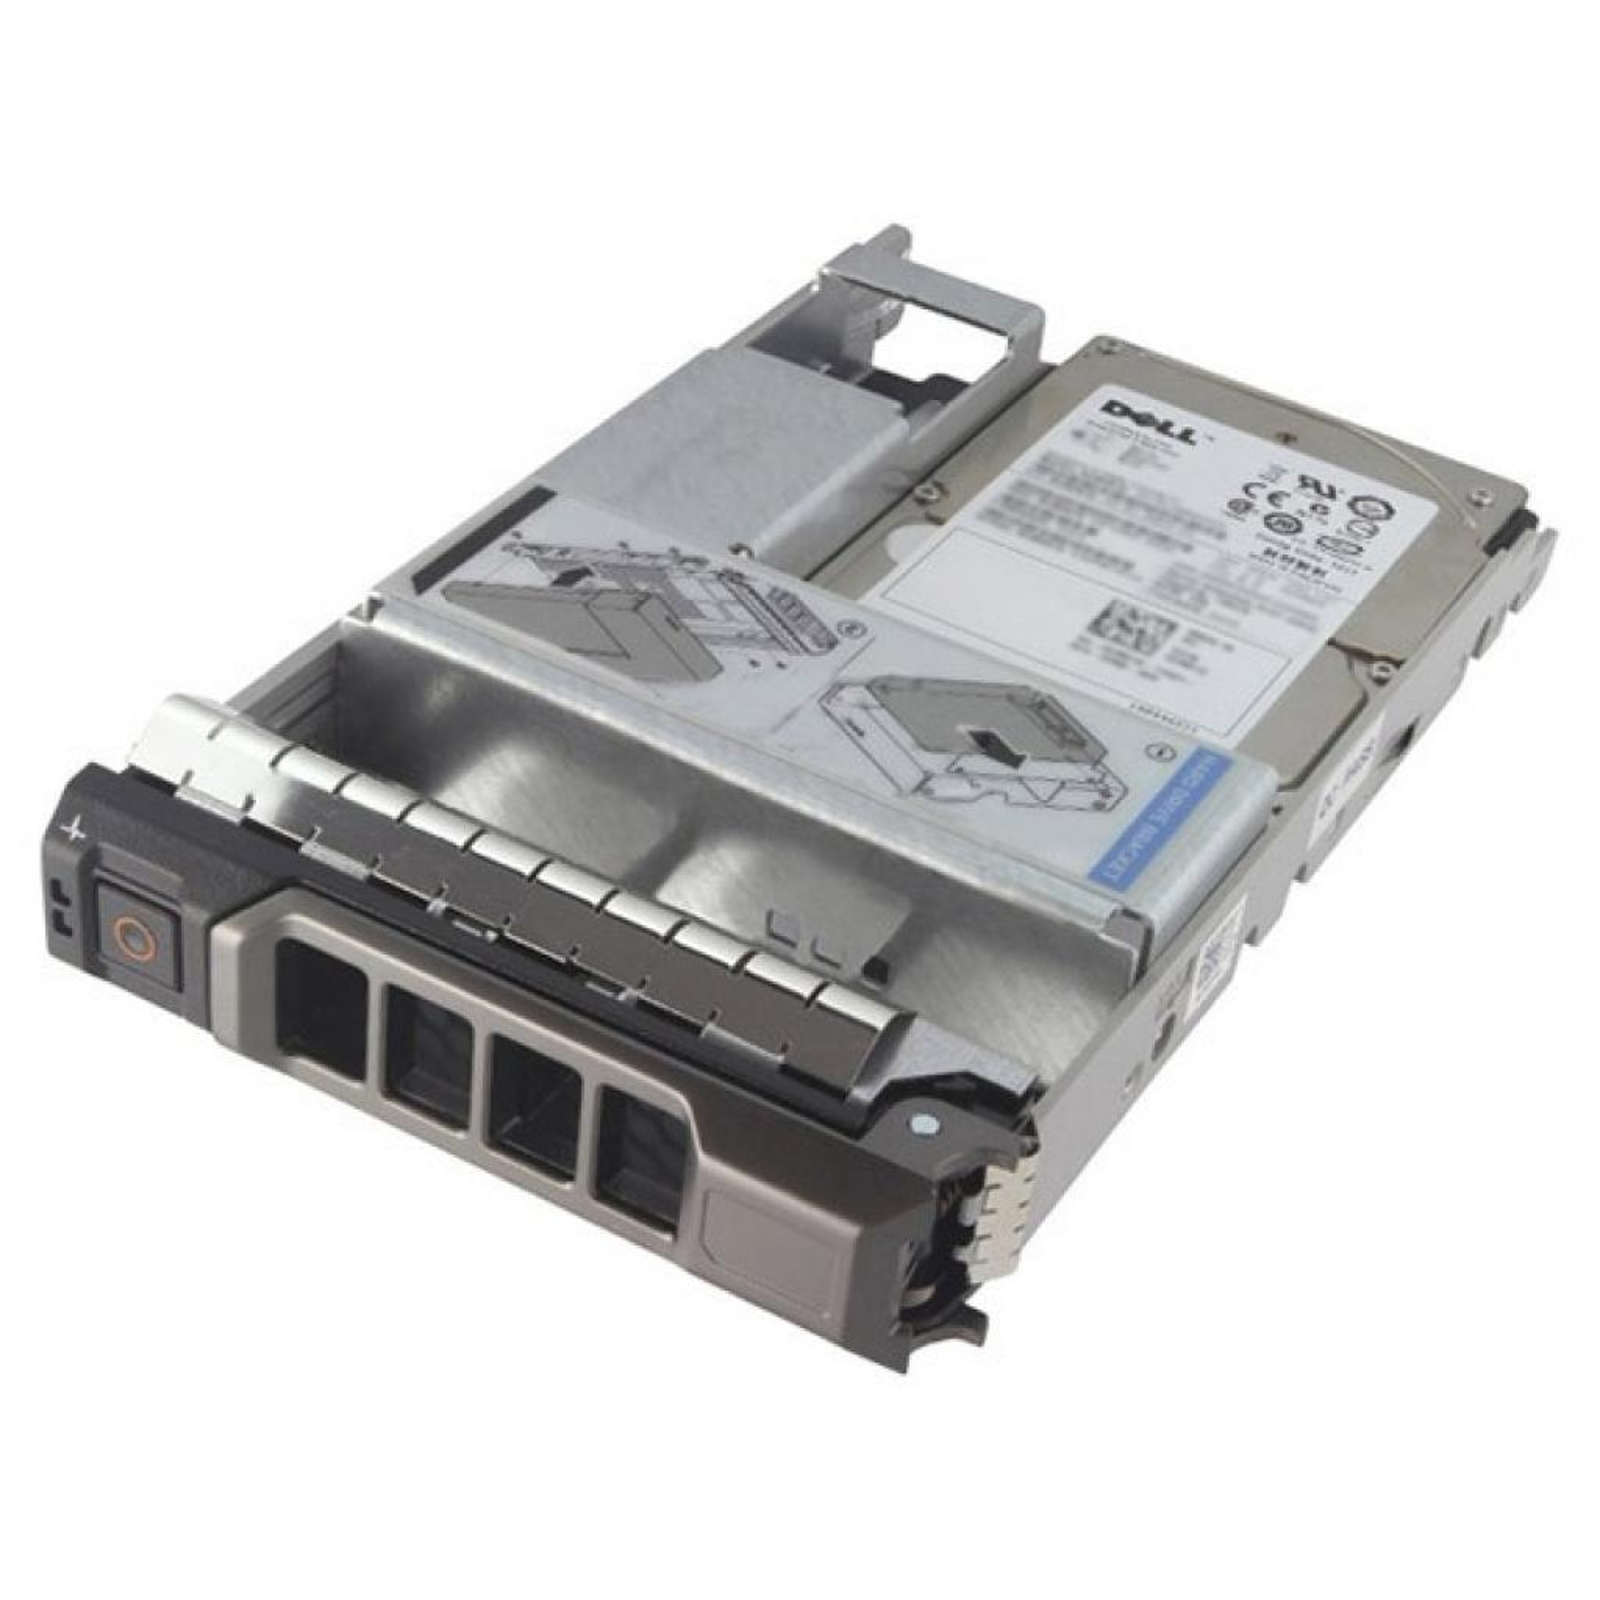 Жесткий диск для сервера Dell 600GB 10K RPM SAS 12Gbps (400-AUNQ)